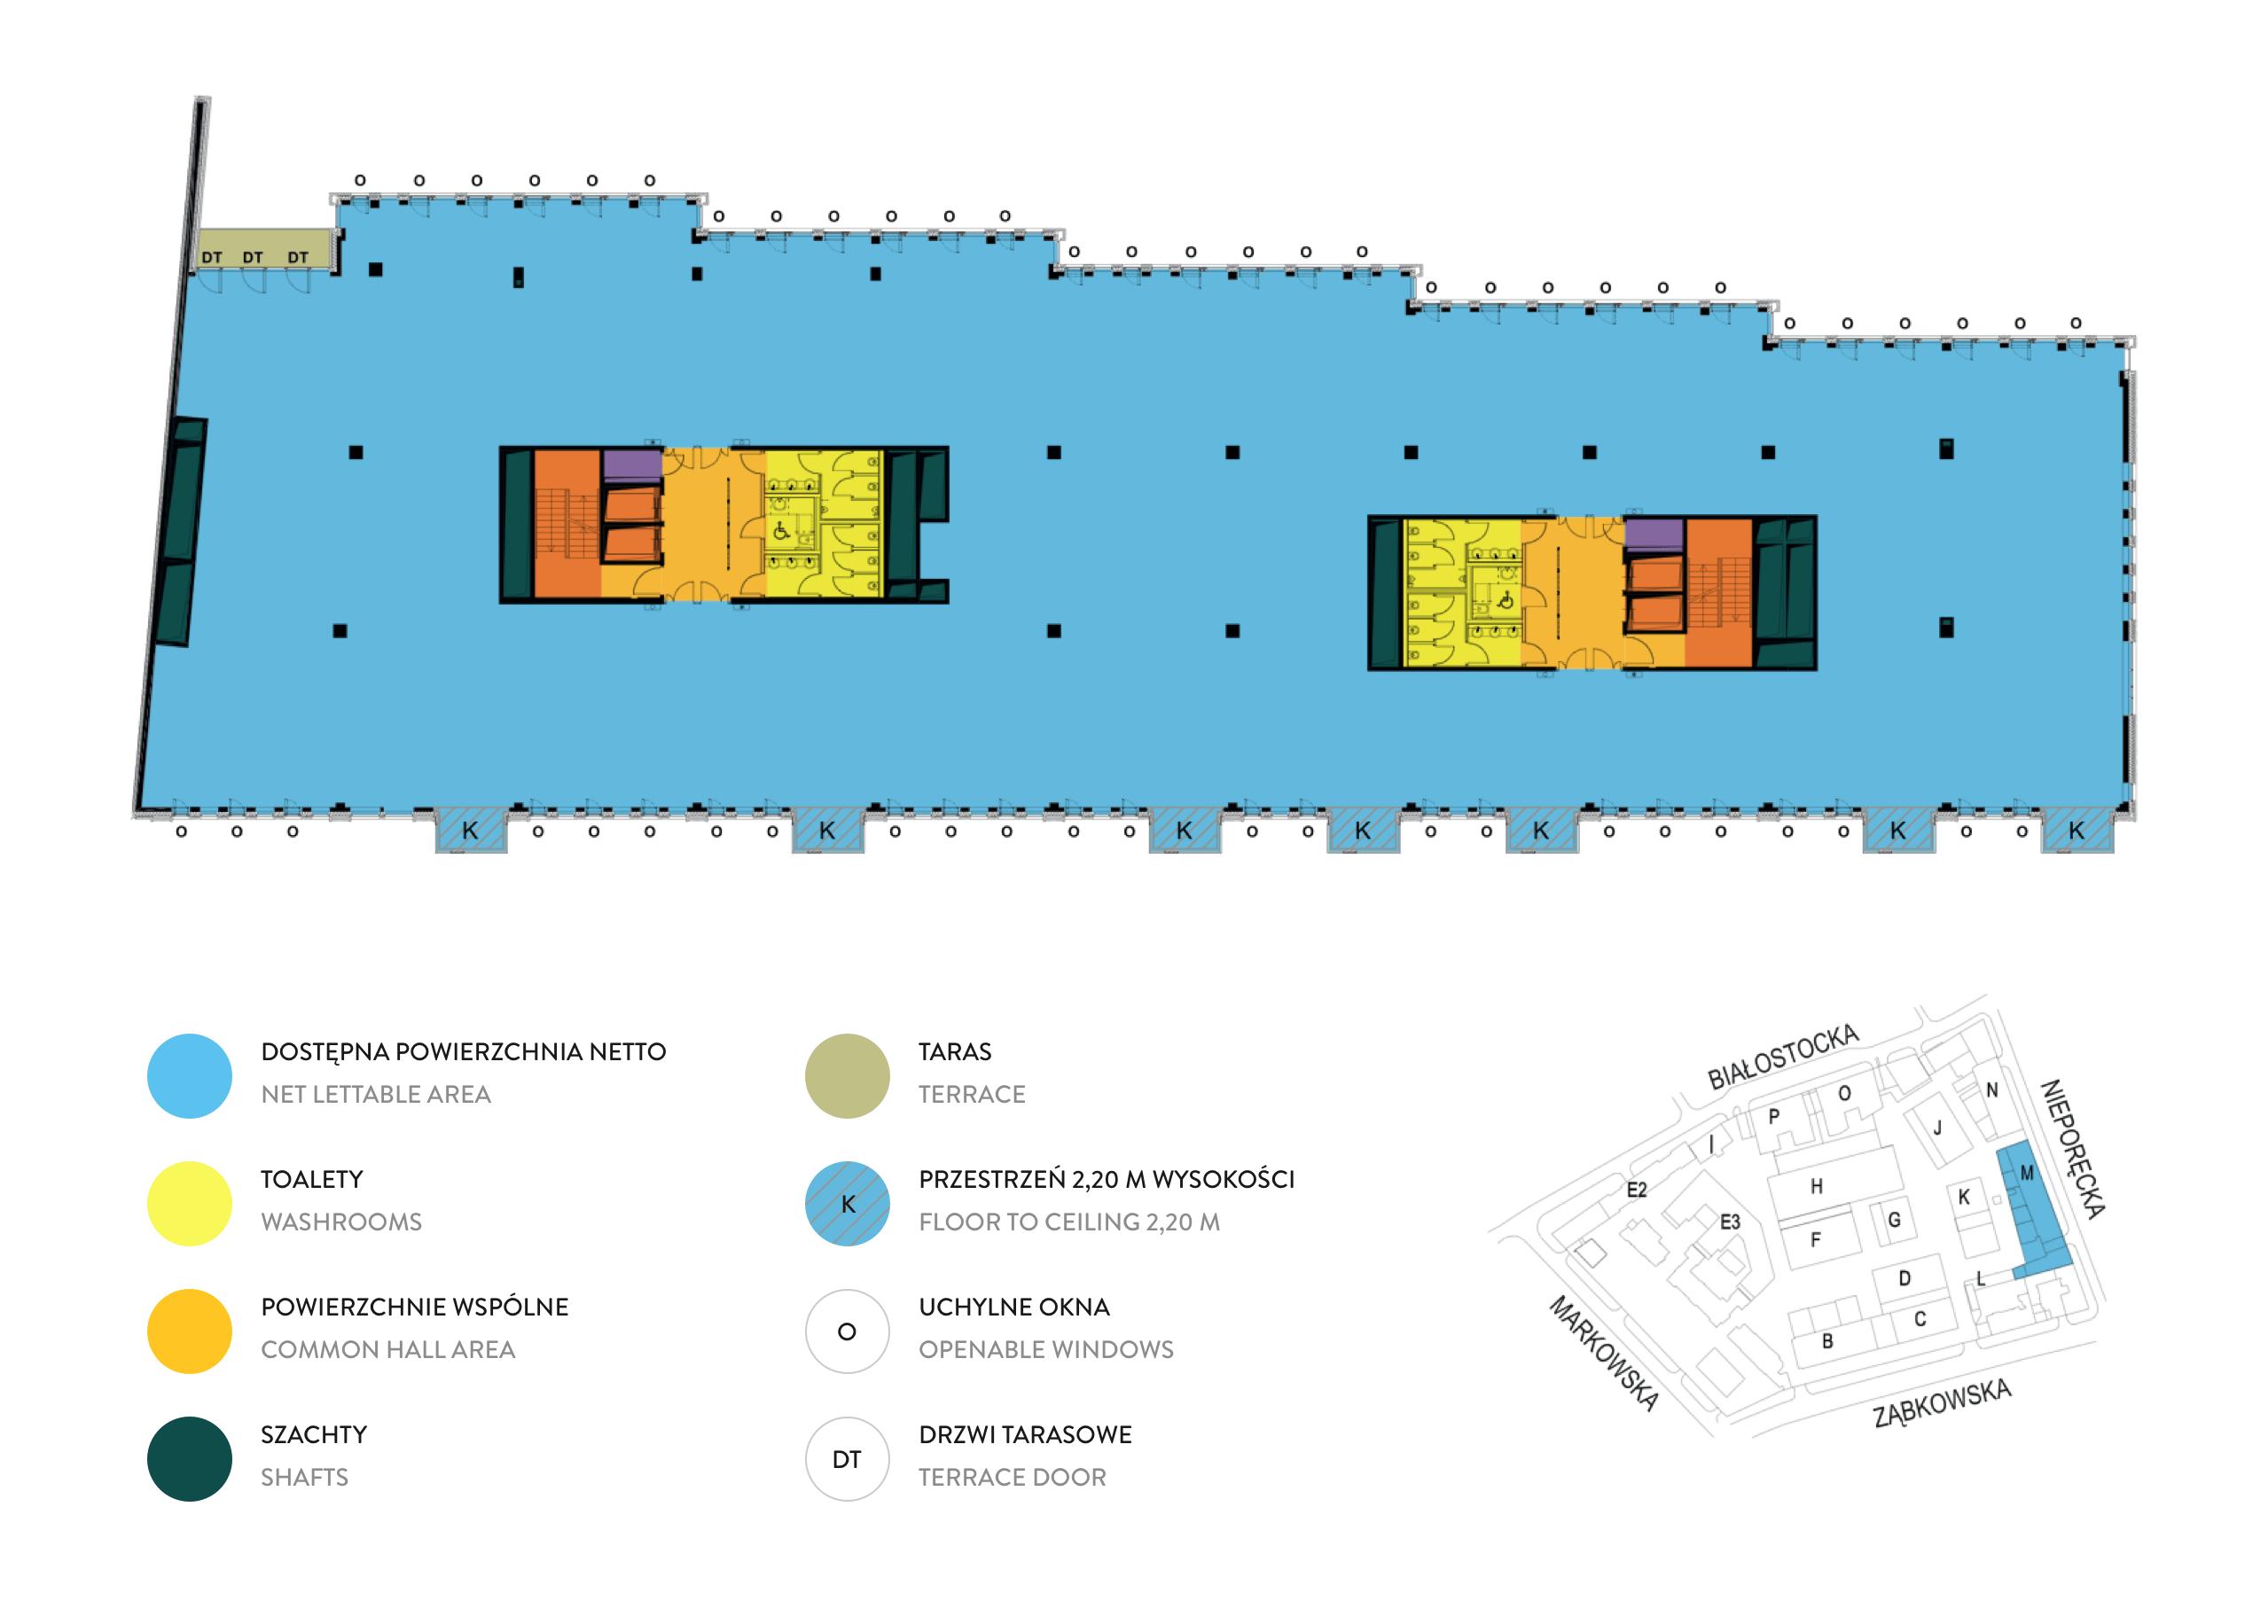 CENTRUM PRASKIE KONESER – MONOPOL Budynek M - zdjęcie 4